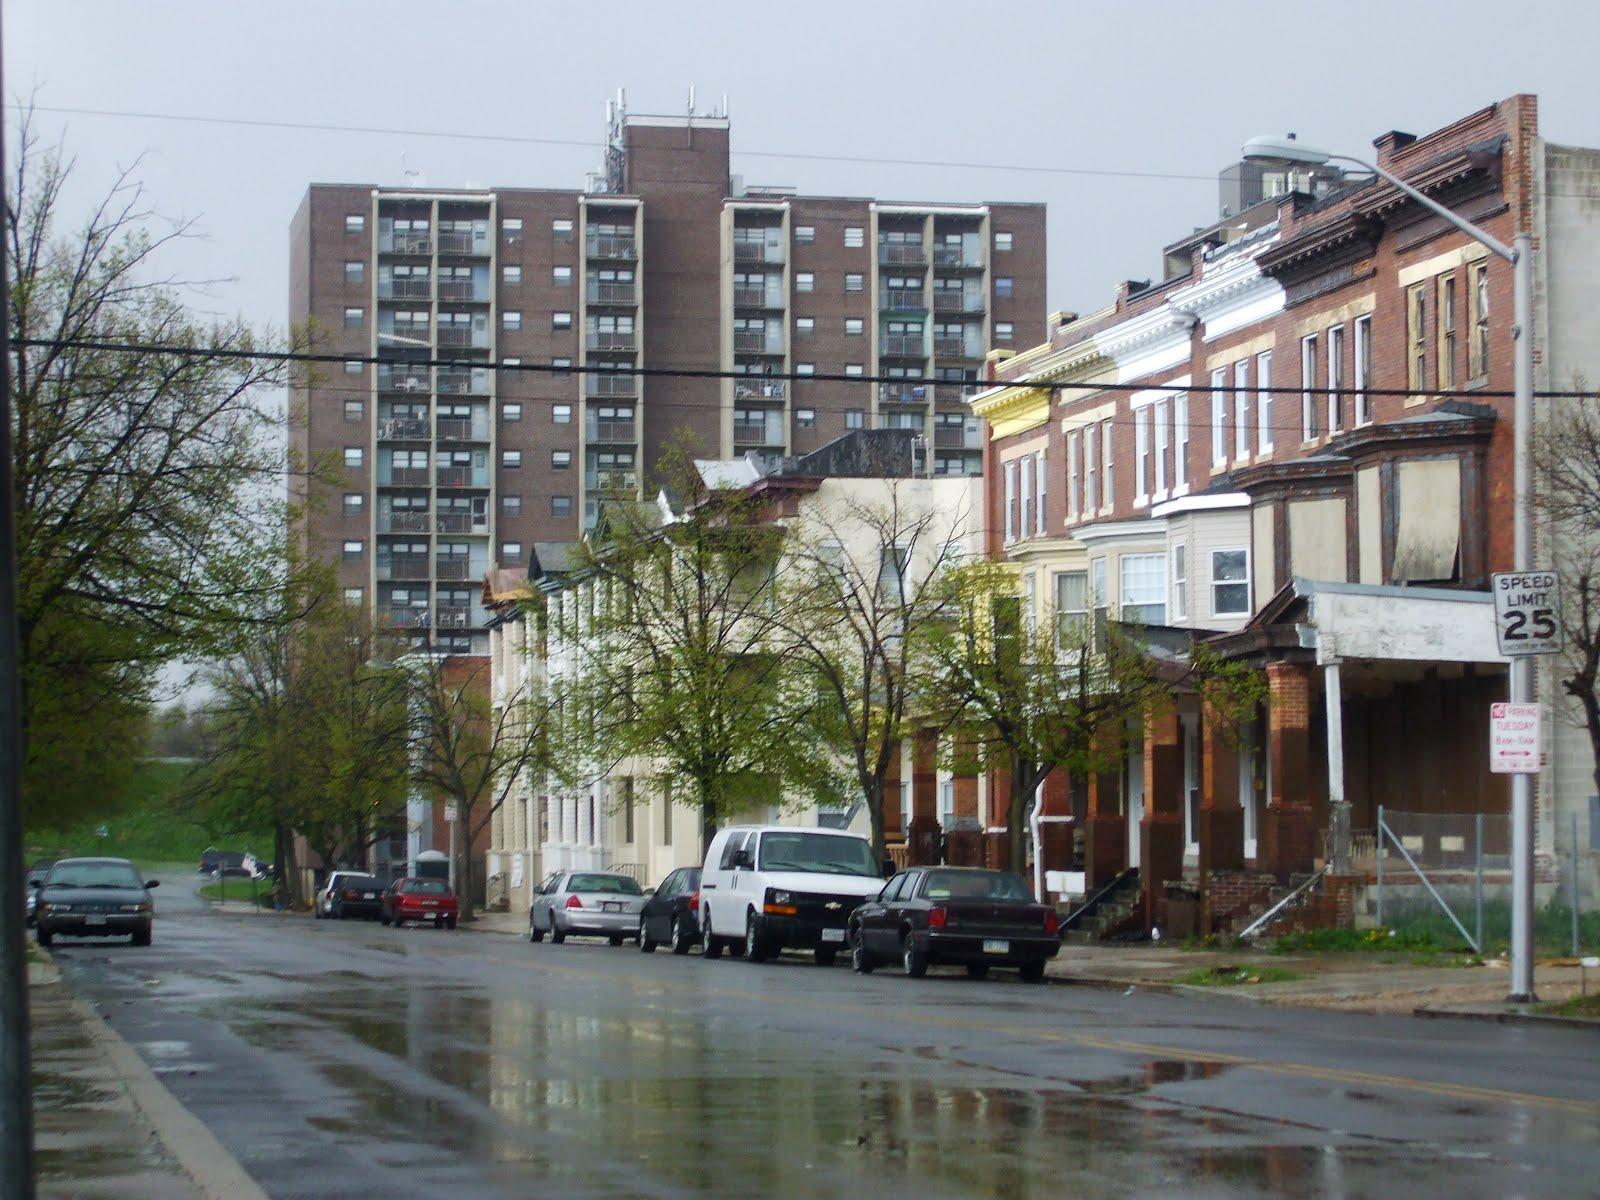 Public Housing in Baltimore